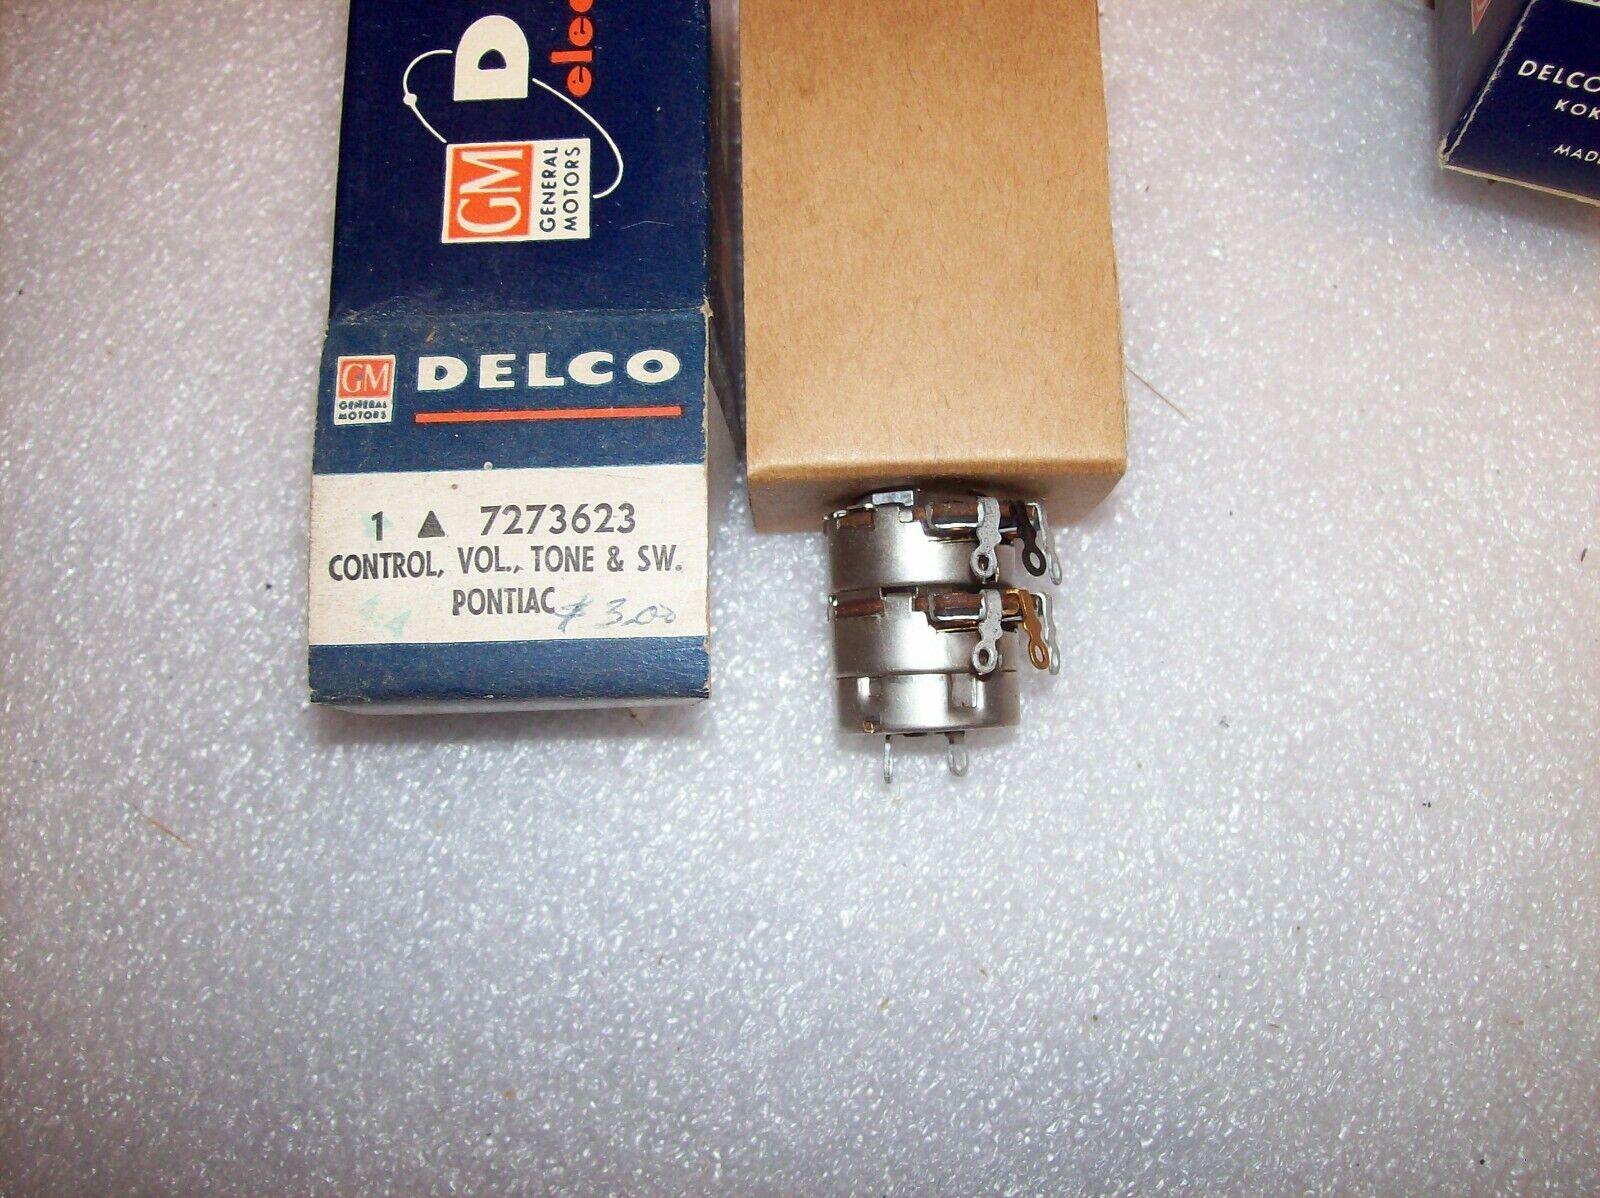 +NOS GM Delco 7273623 Radio Control Volume Tone & Switch 1959 Pontiac 988976 977